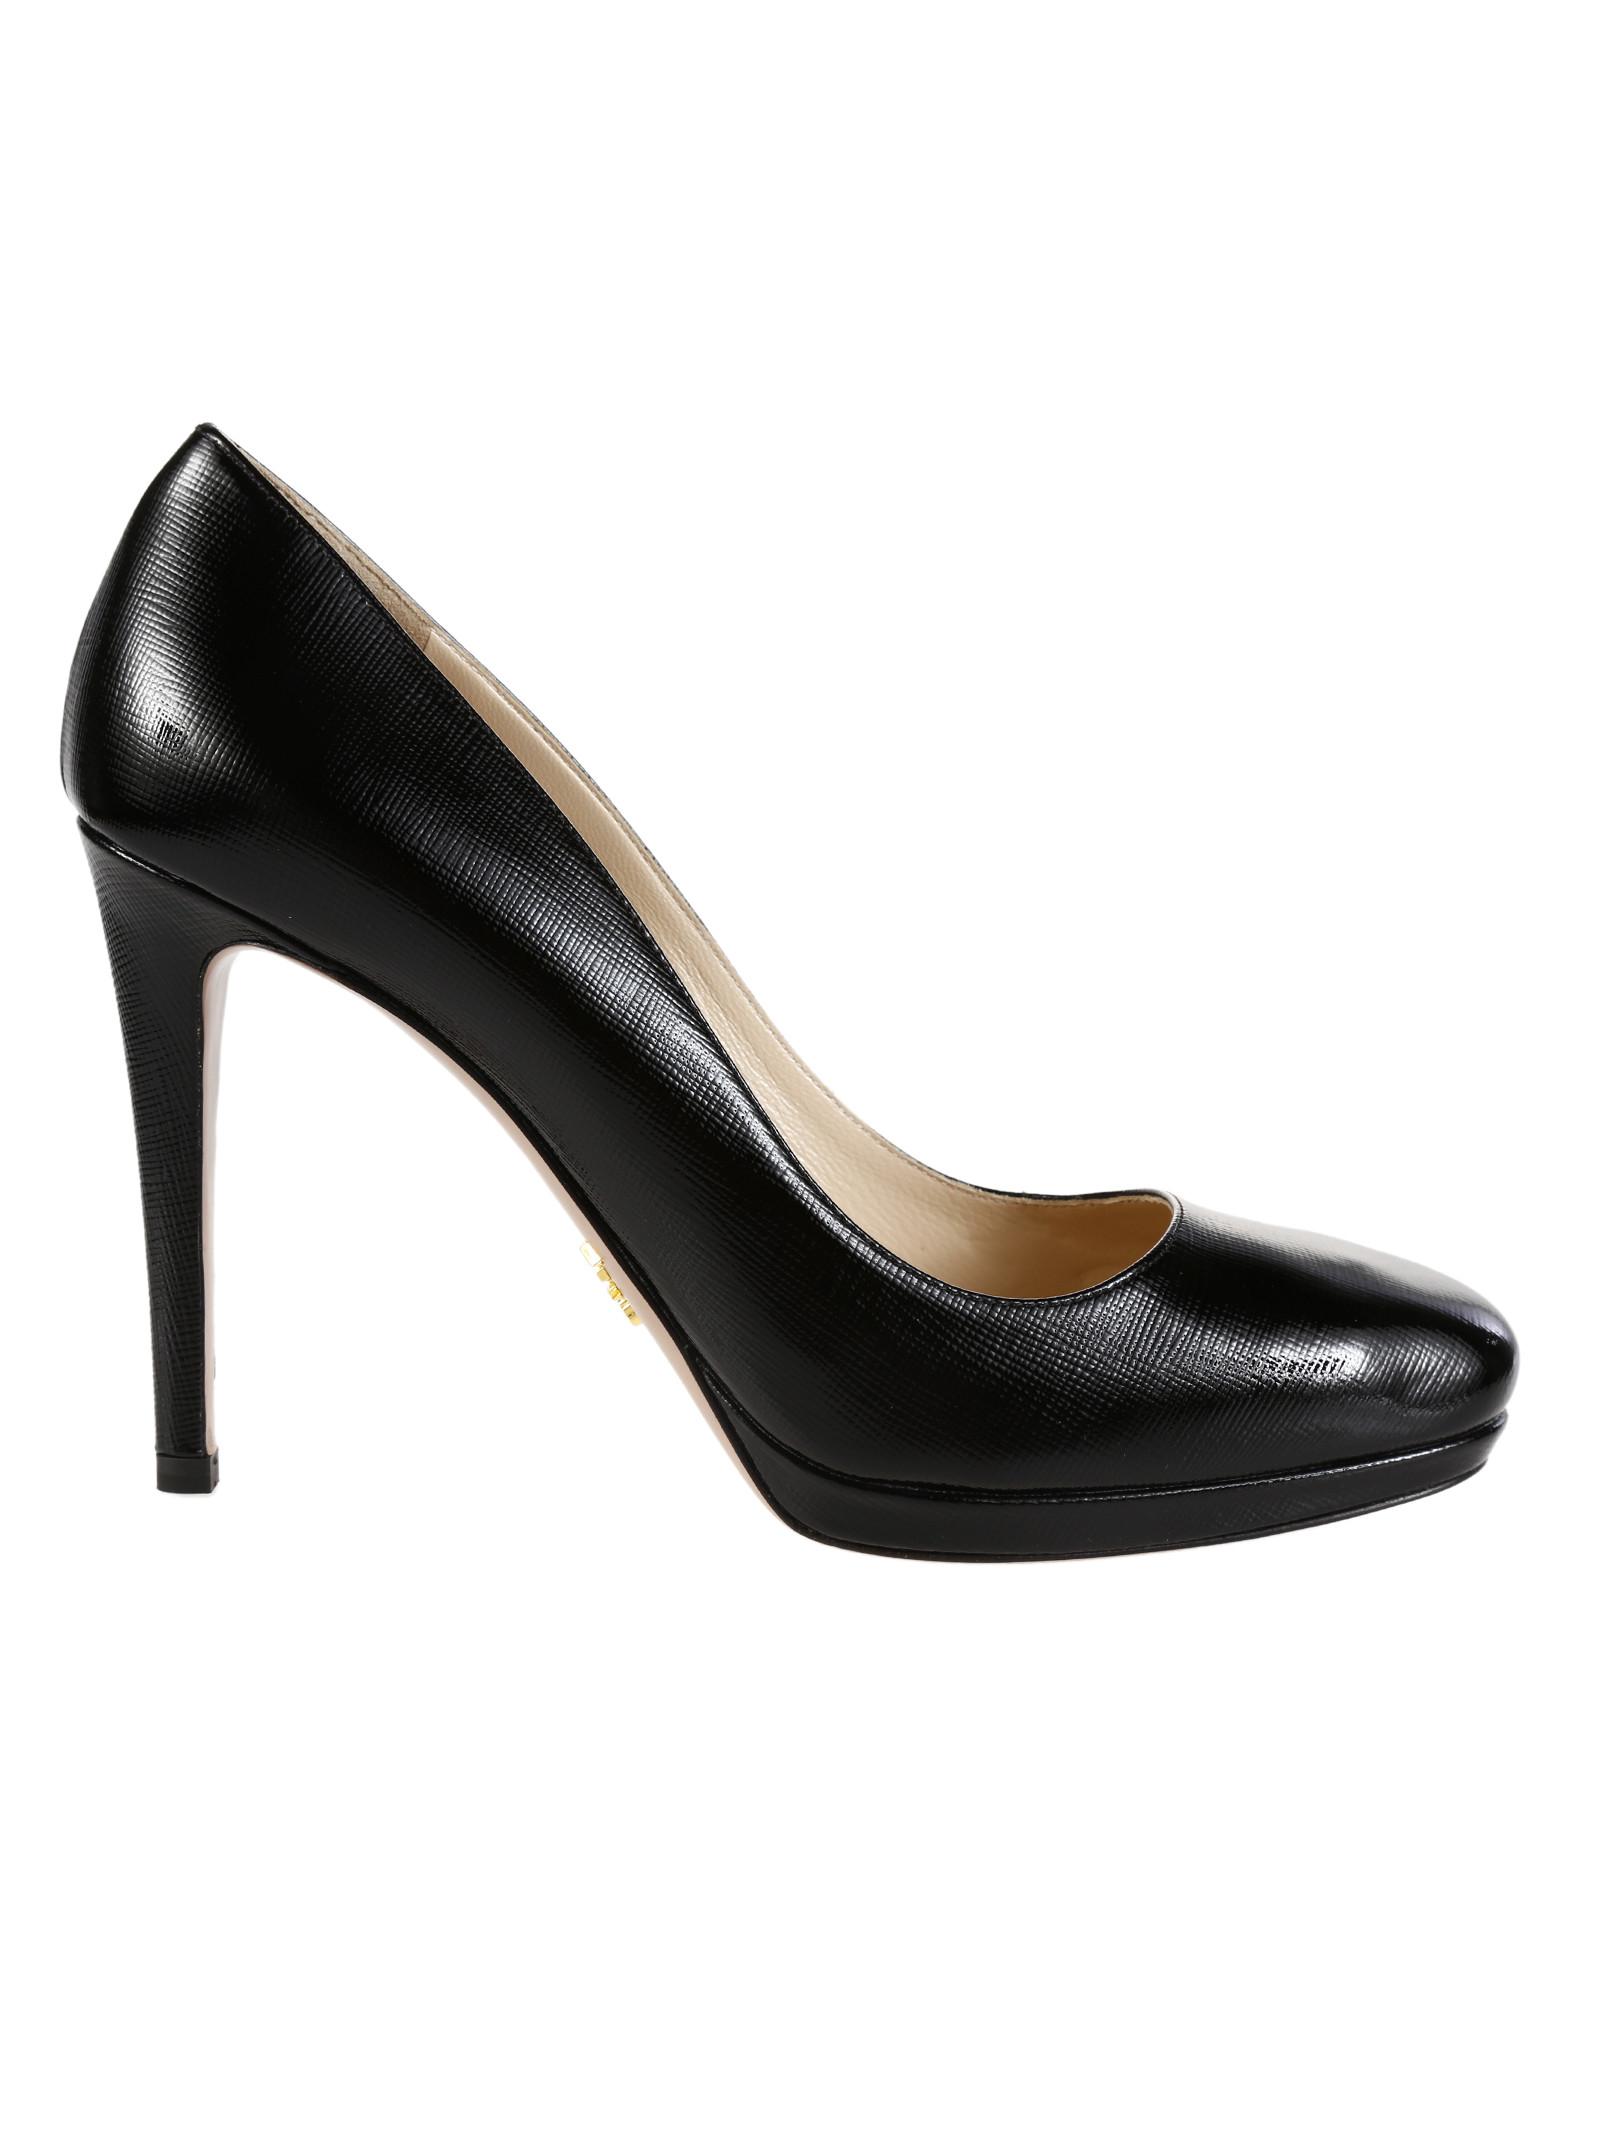 Asos Black Patent Leather Shoes